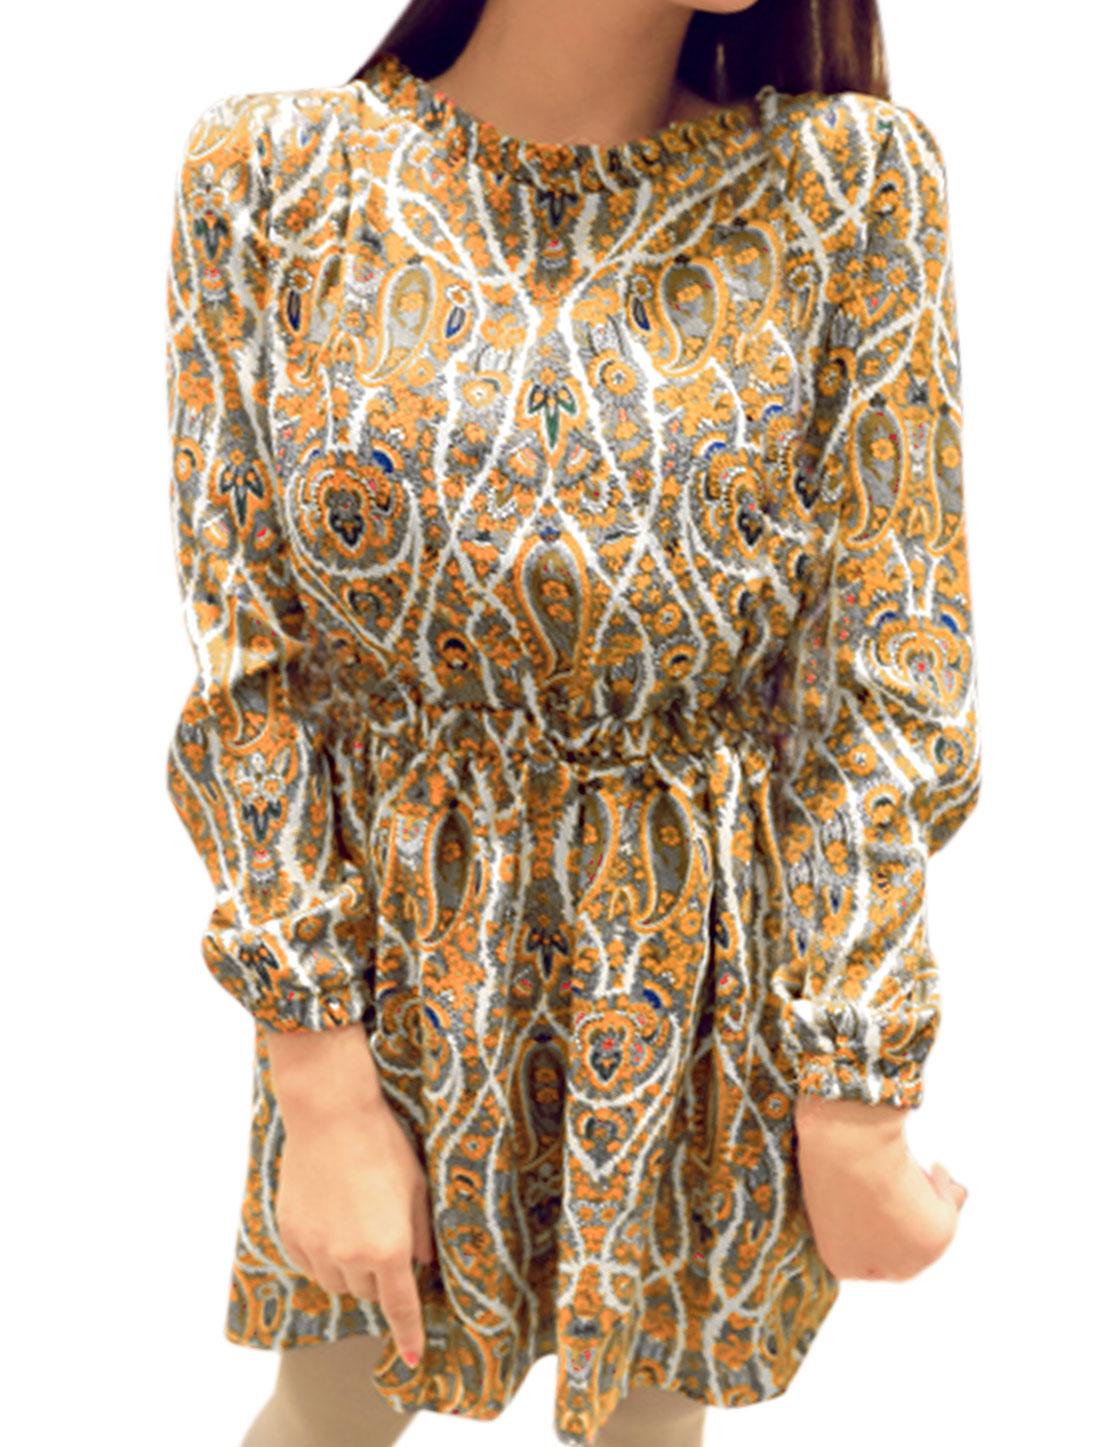 Women Elastic Waist w Cuffs Paisleys Print Floral Print Dress Orange XS